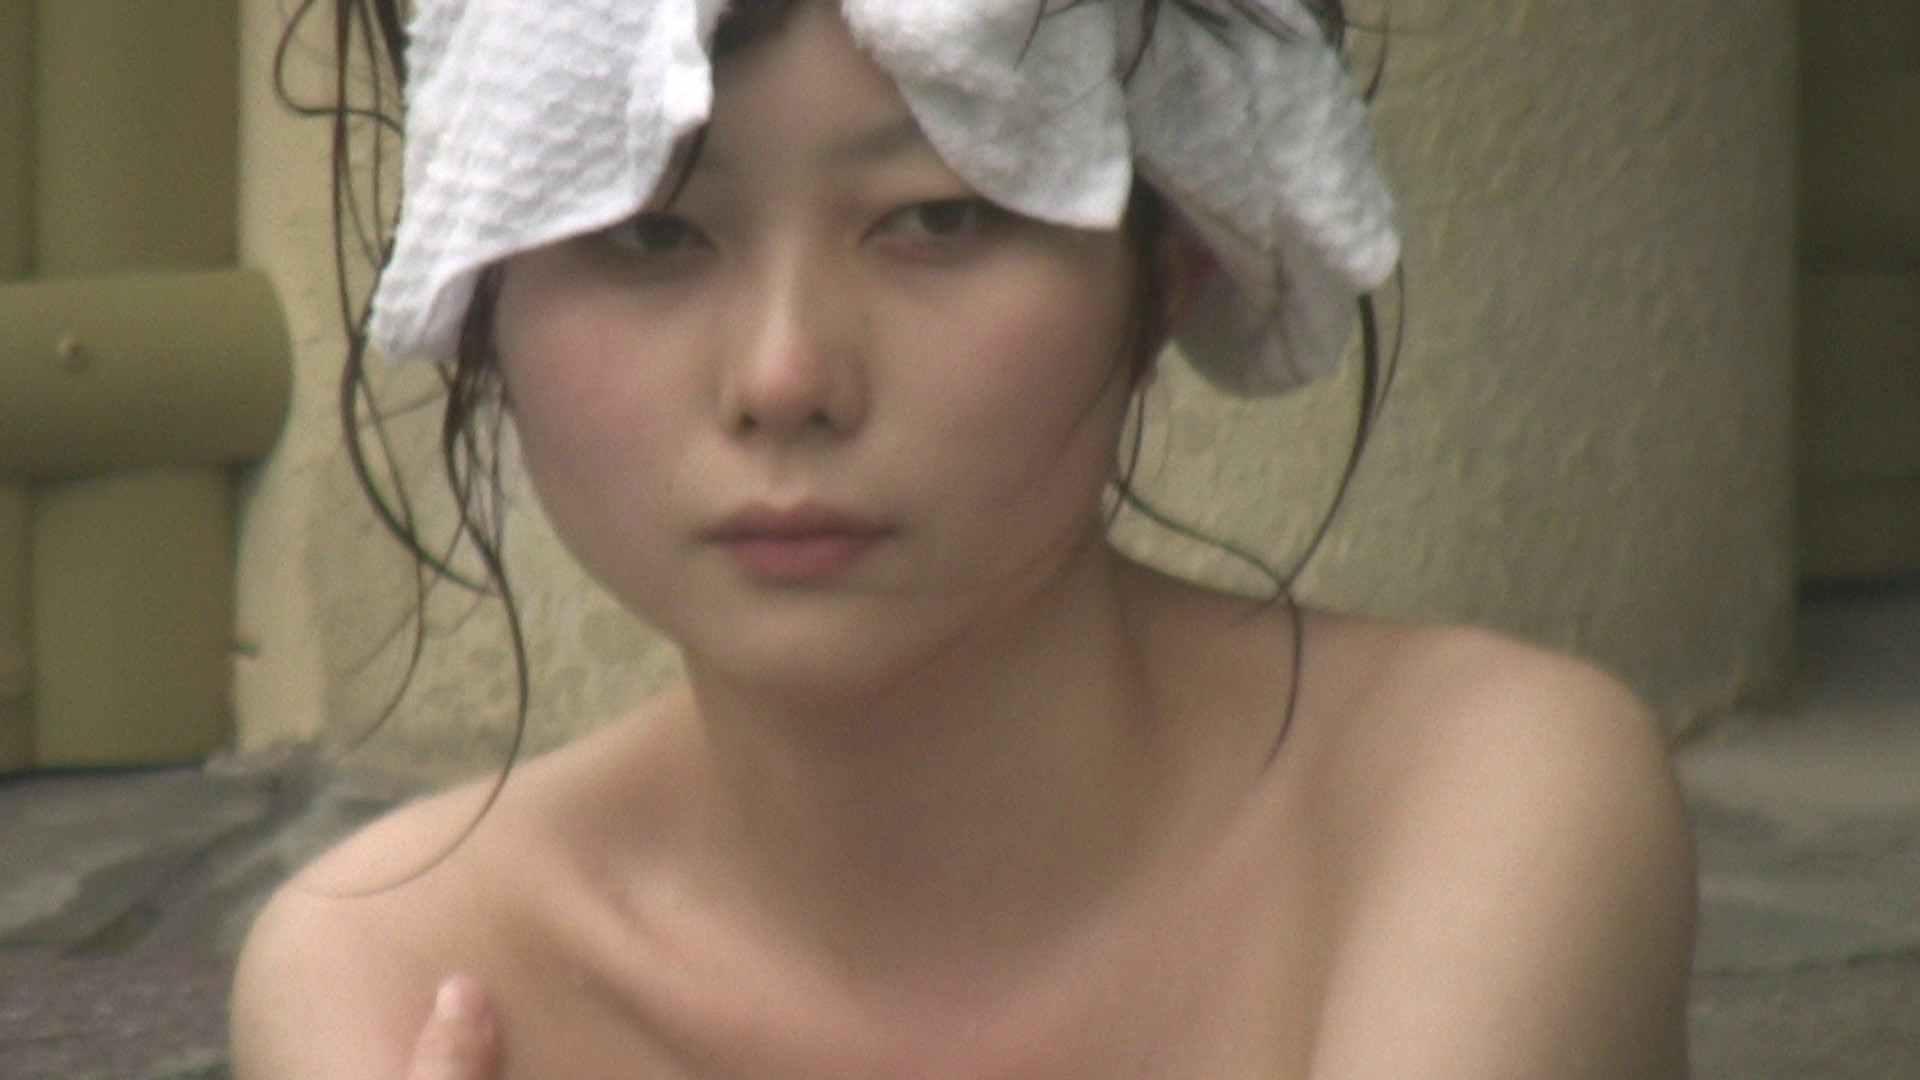 Aquaな露天風呂Vol.147 盗撮シリーズ | 露天風呂編  80PIX 69